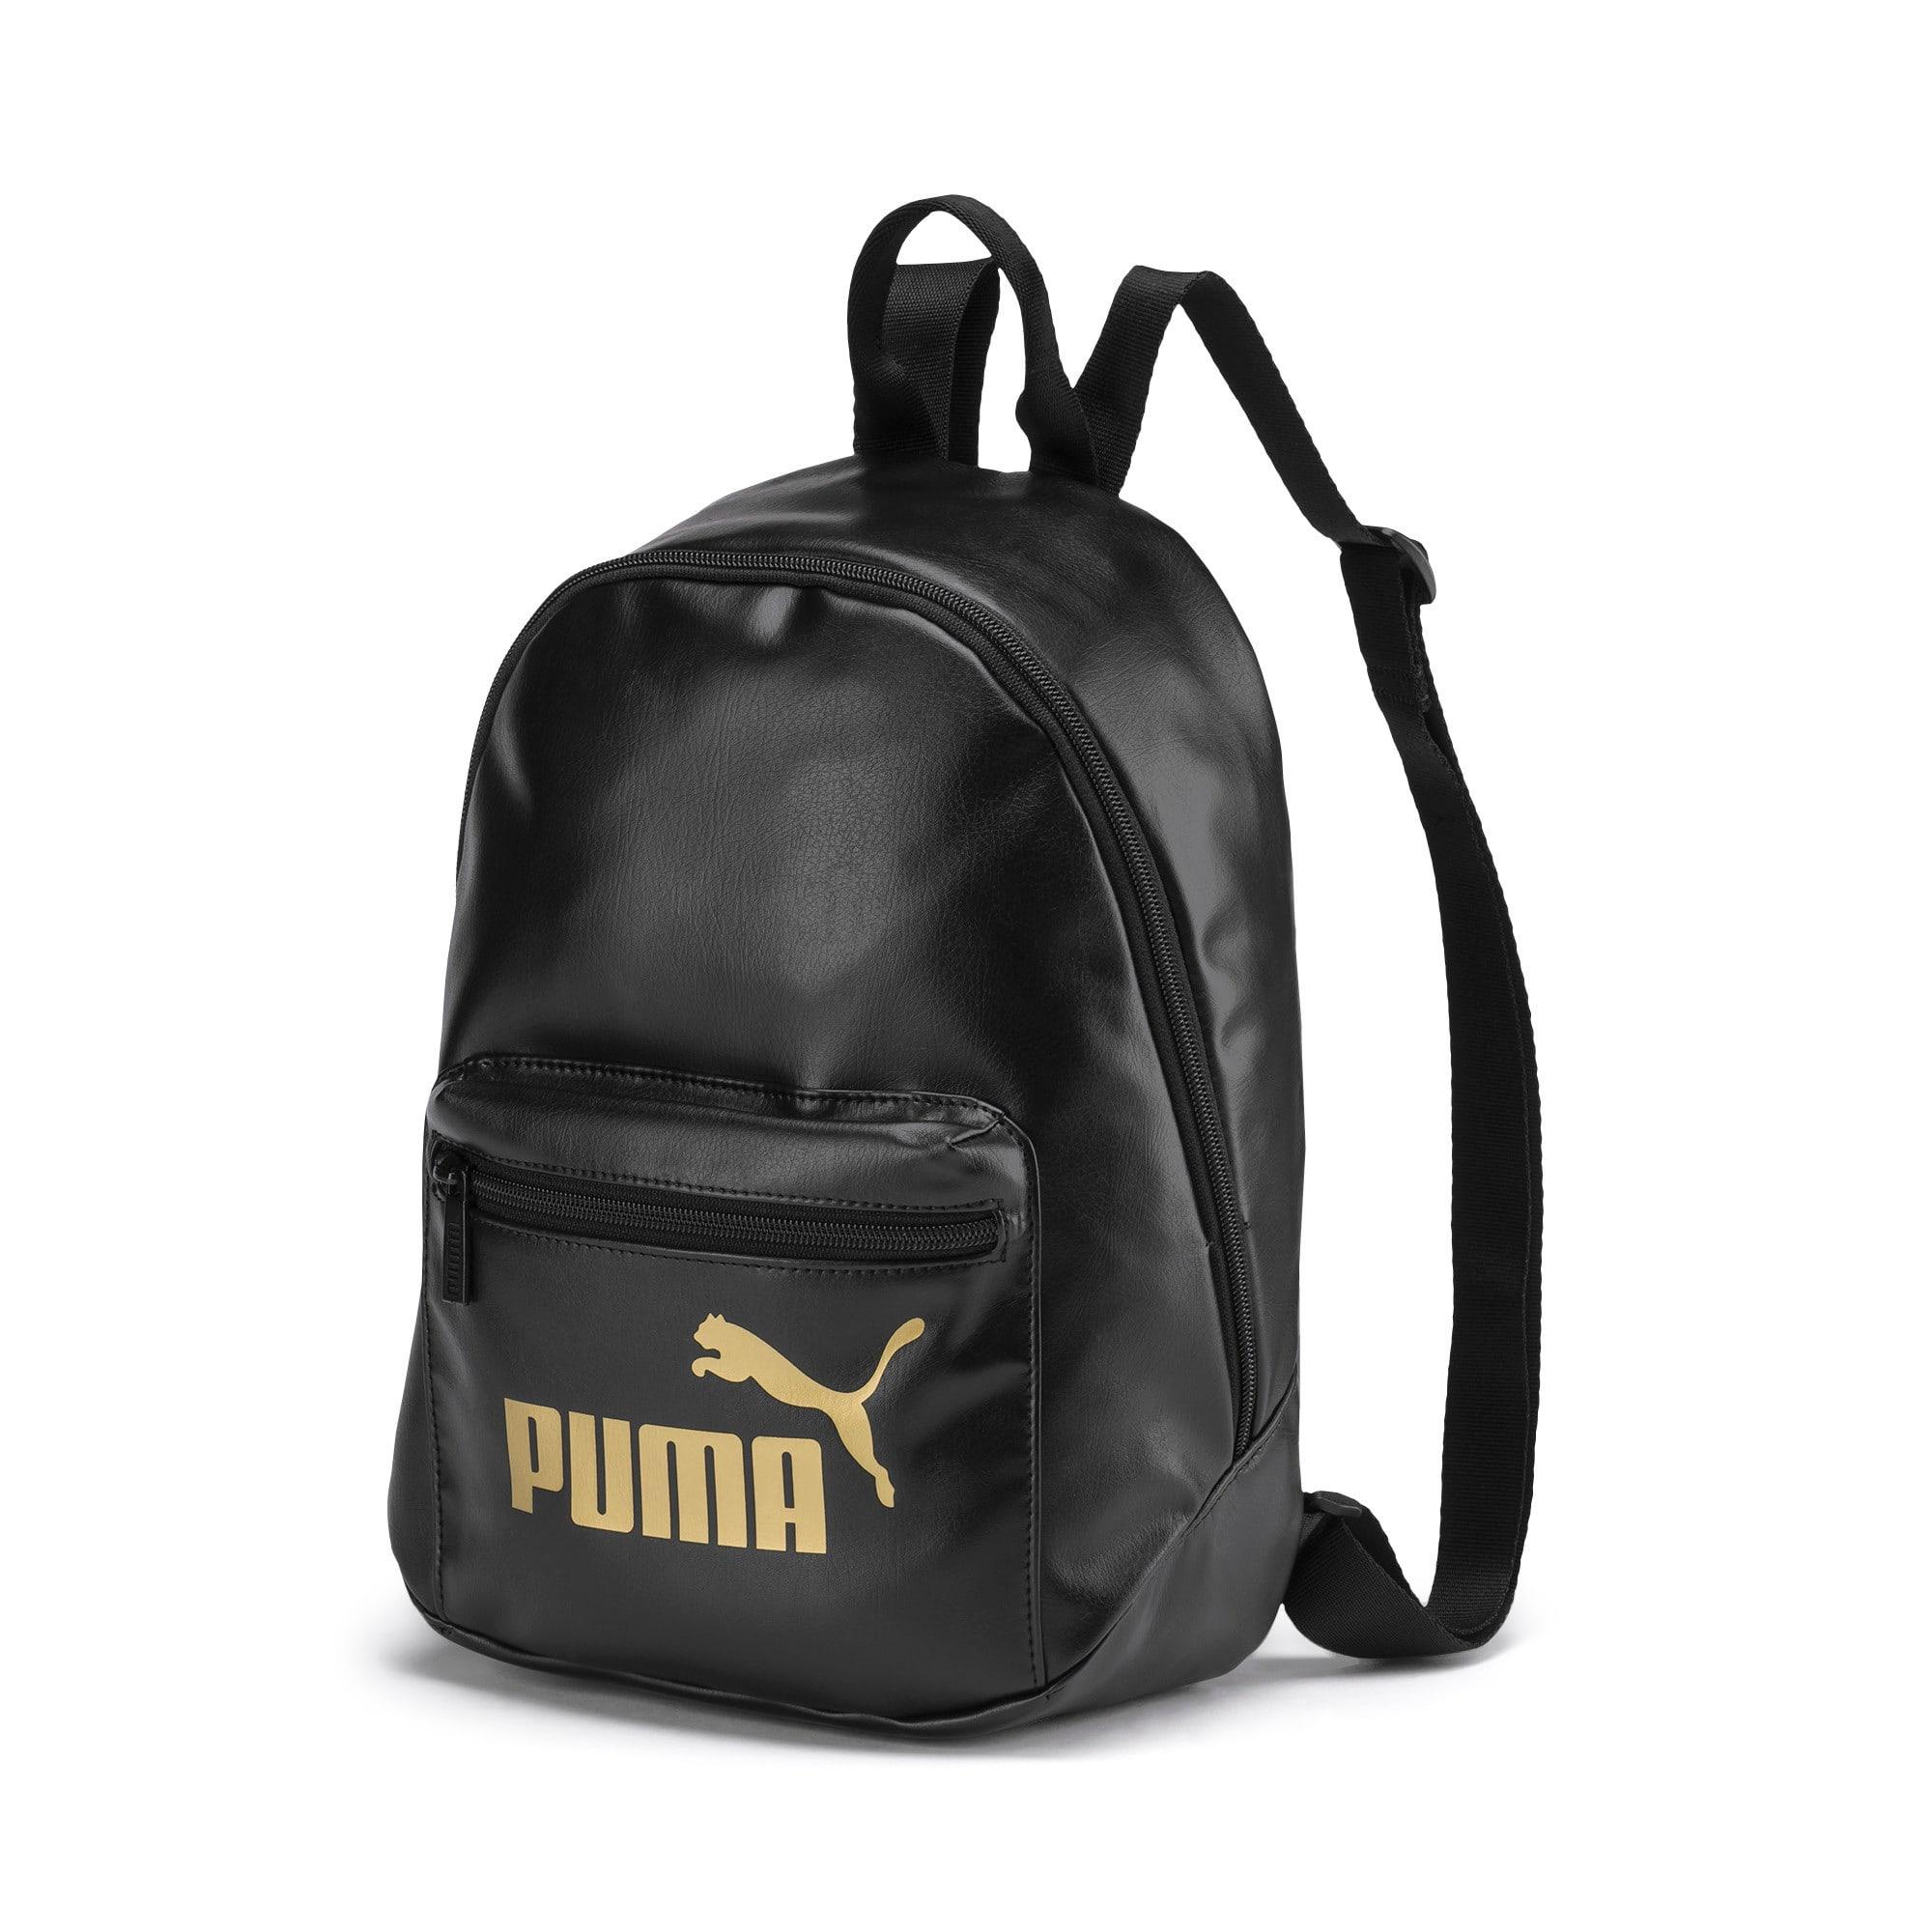 Thumbnail 1 of Up Women's Archive Backpack, Puma Black-Gold, medium